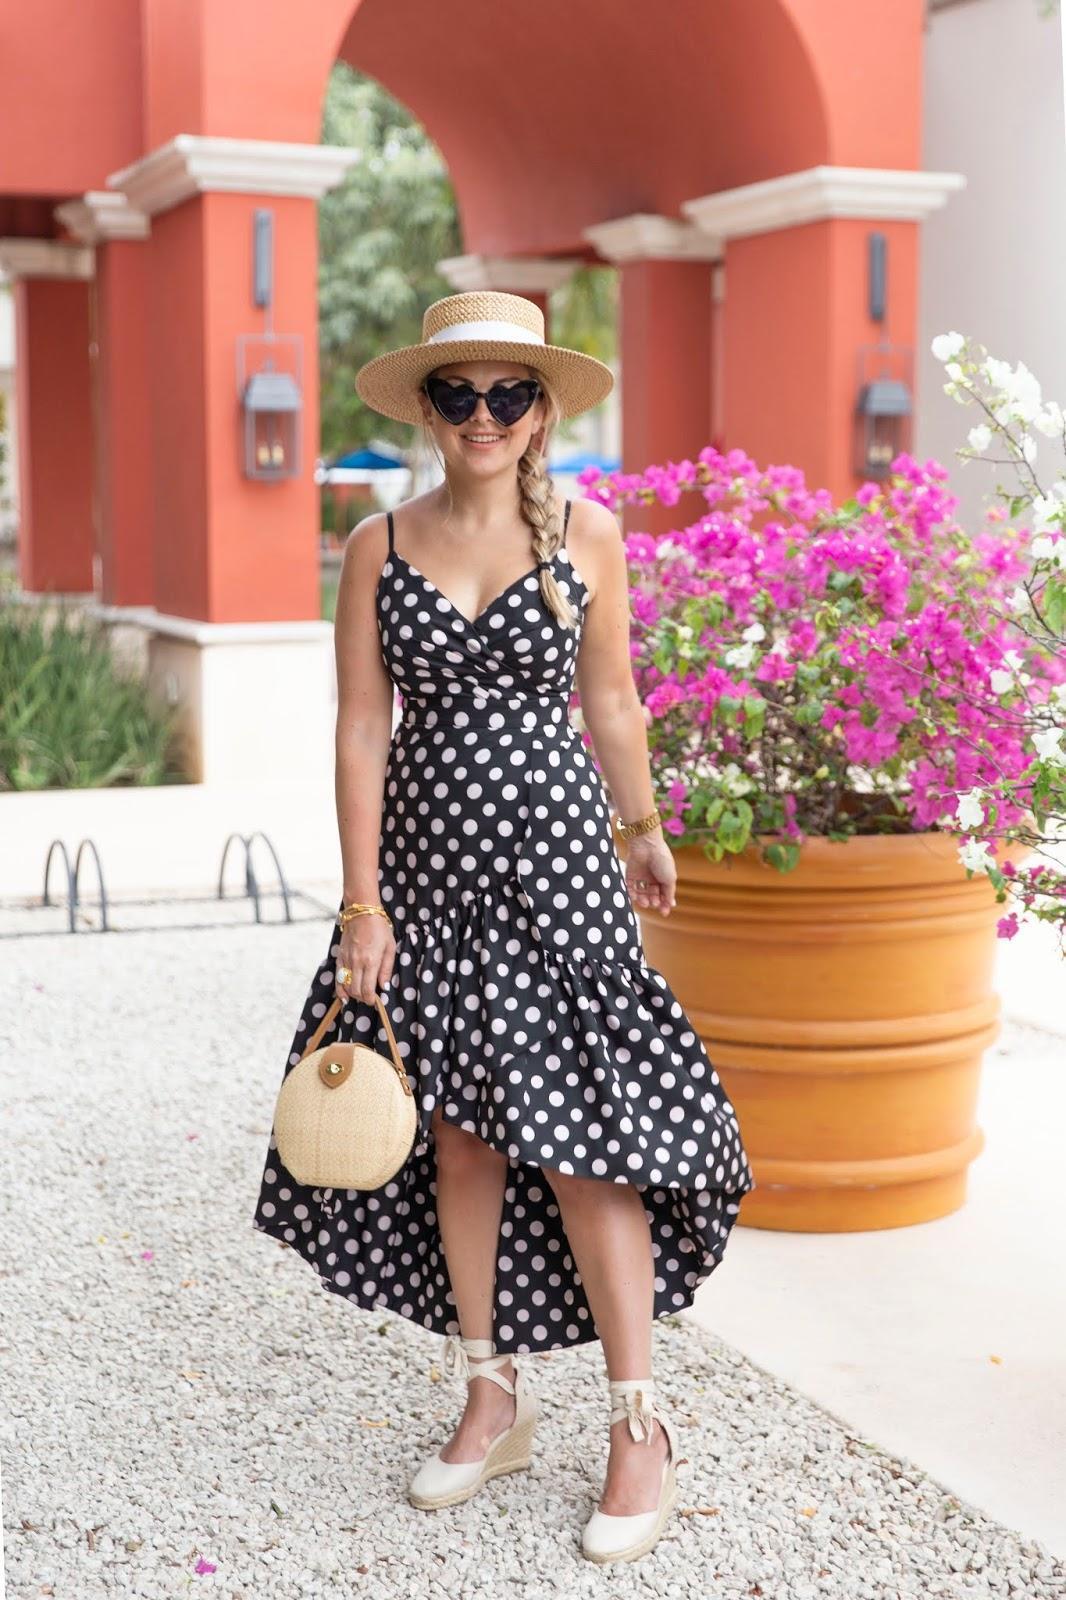 suburban faux-pas blogger hat sunglasses dress bag shoes polka dots polka dots dress spring outfits wedges